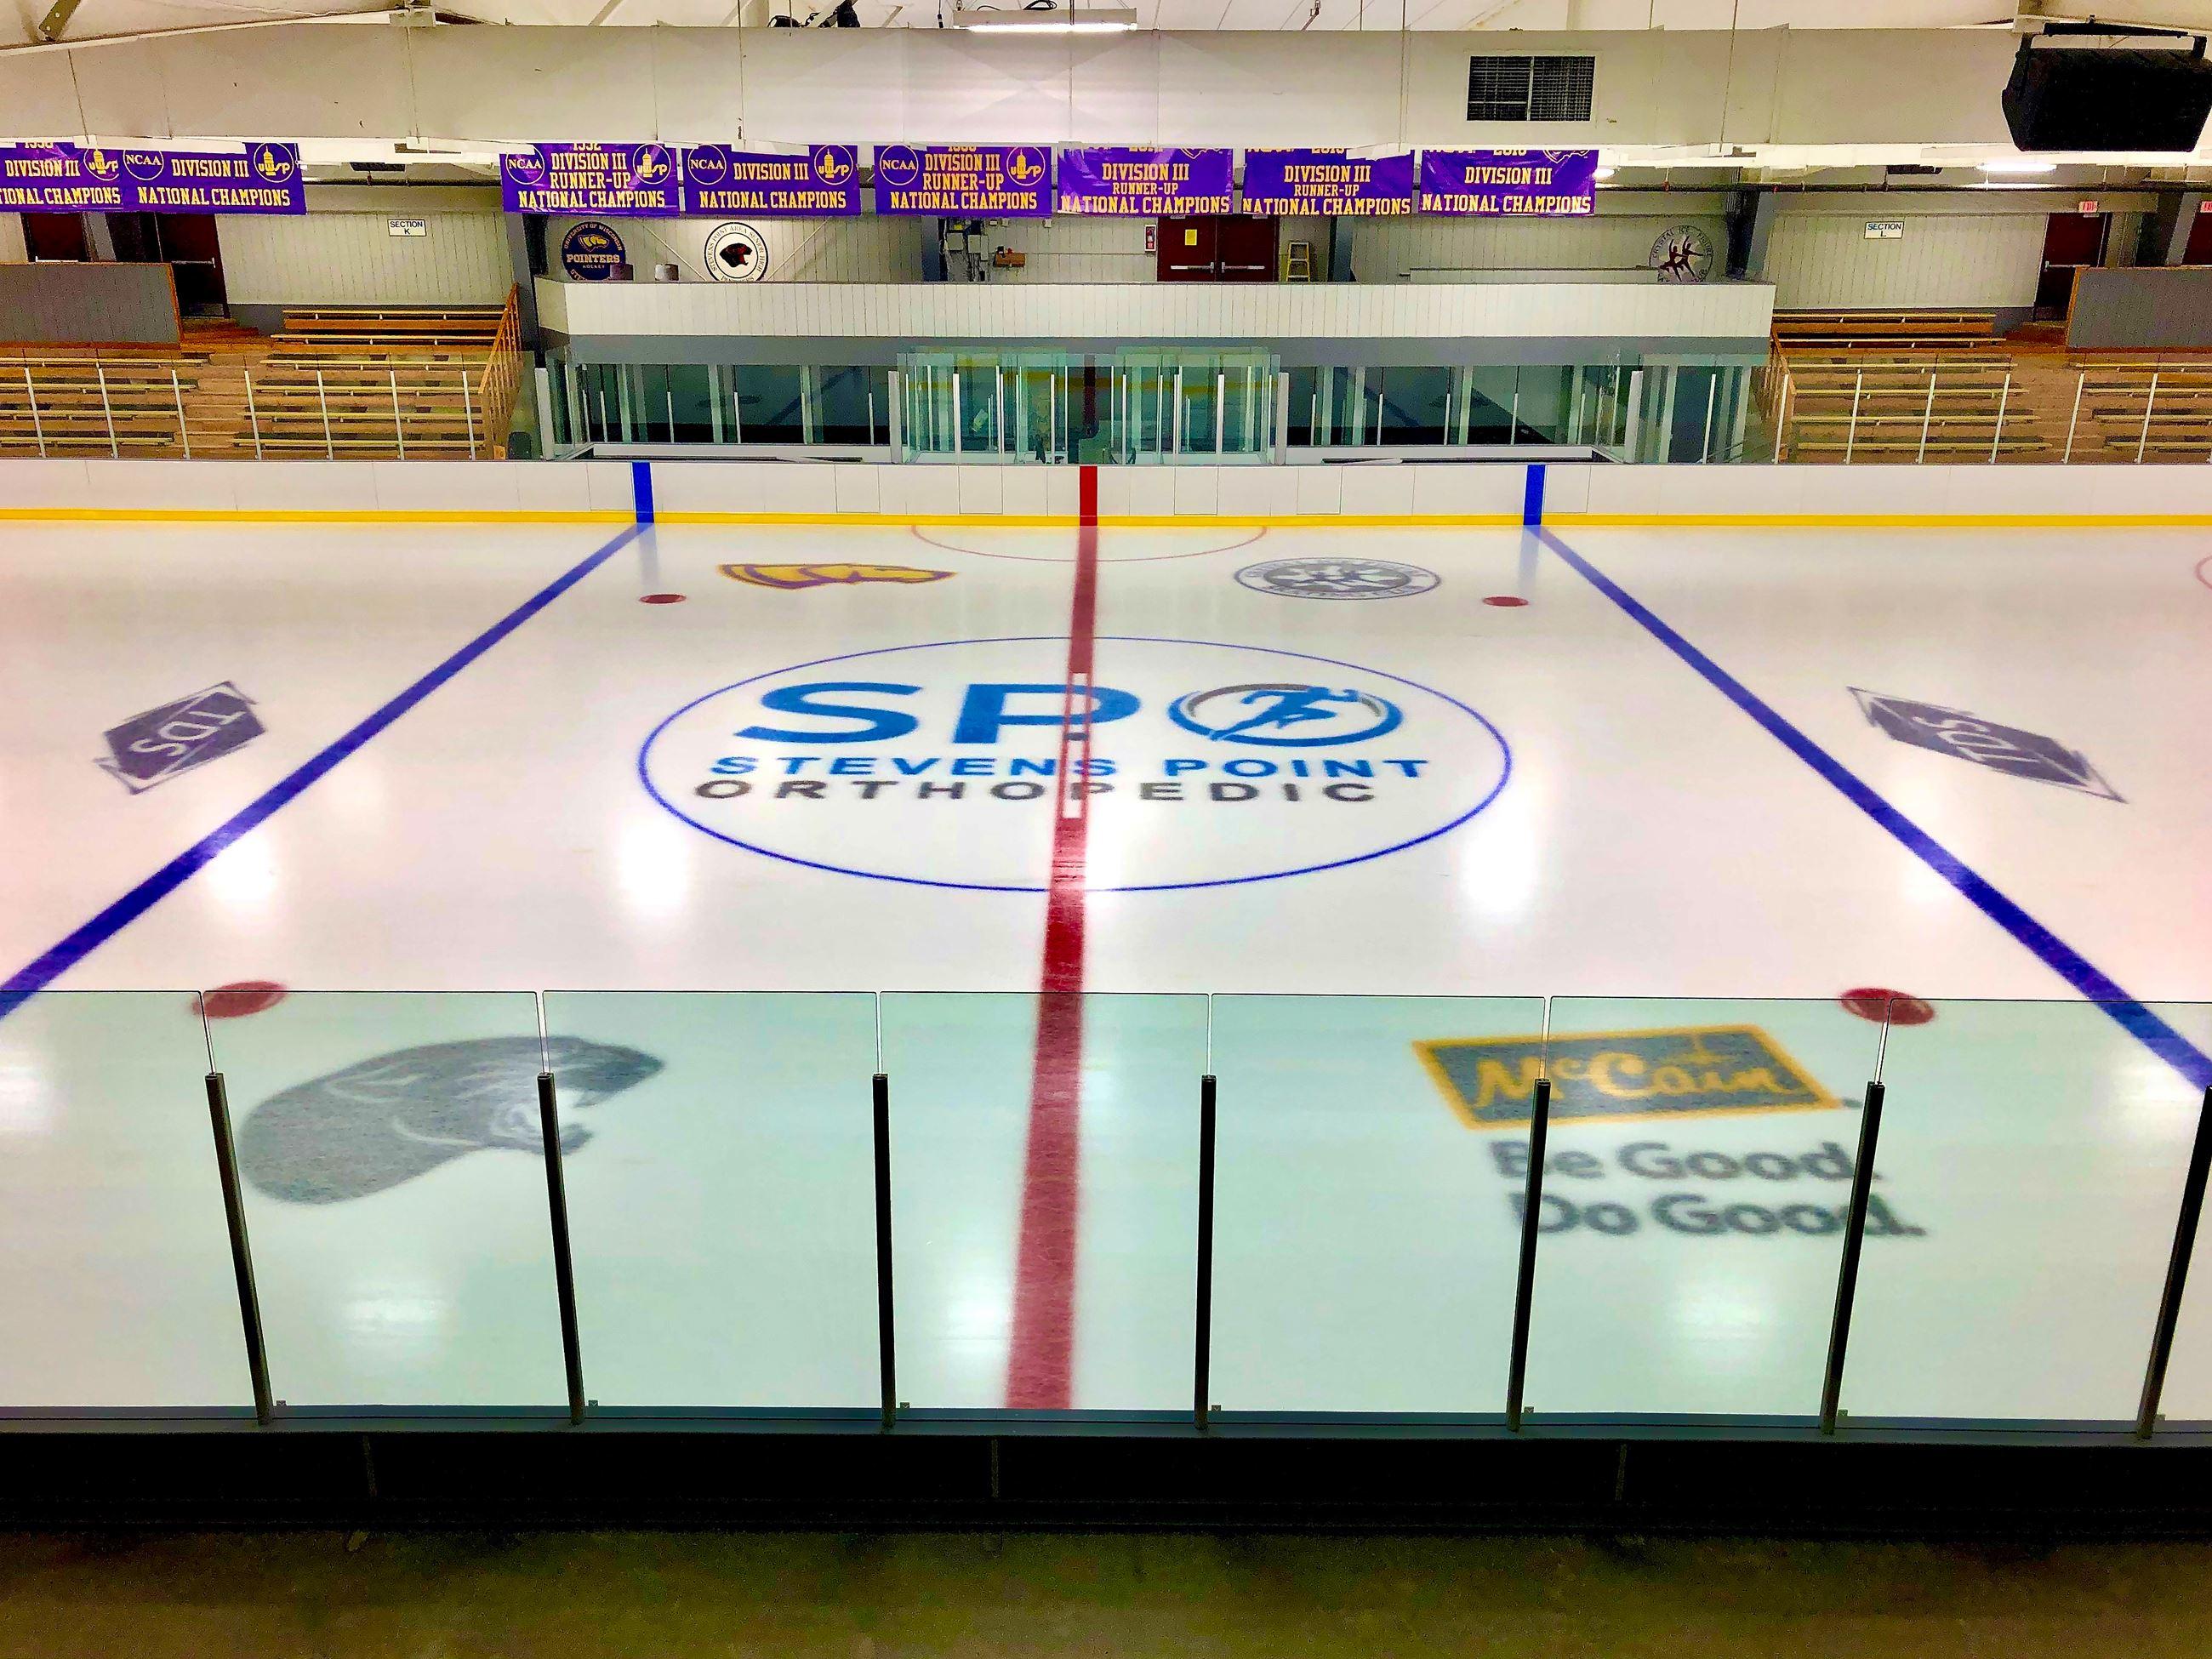 Willett Ice Rink 2019 Opens in new window